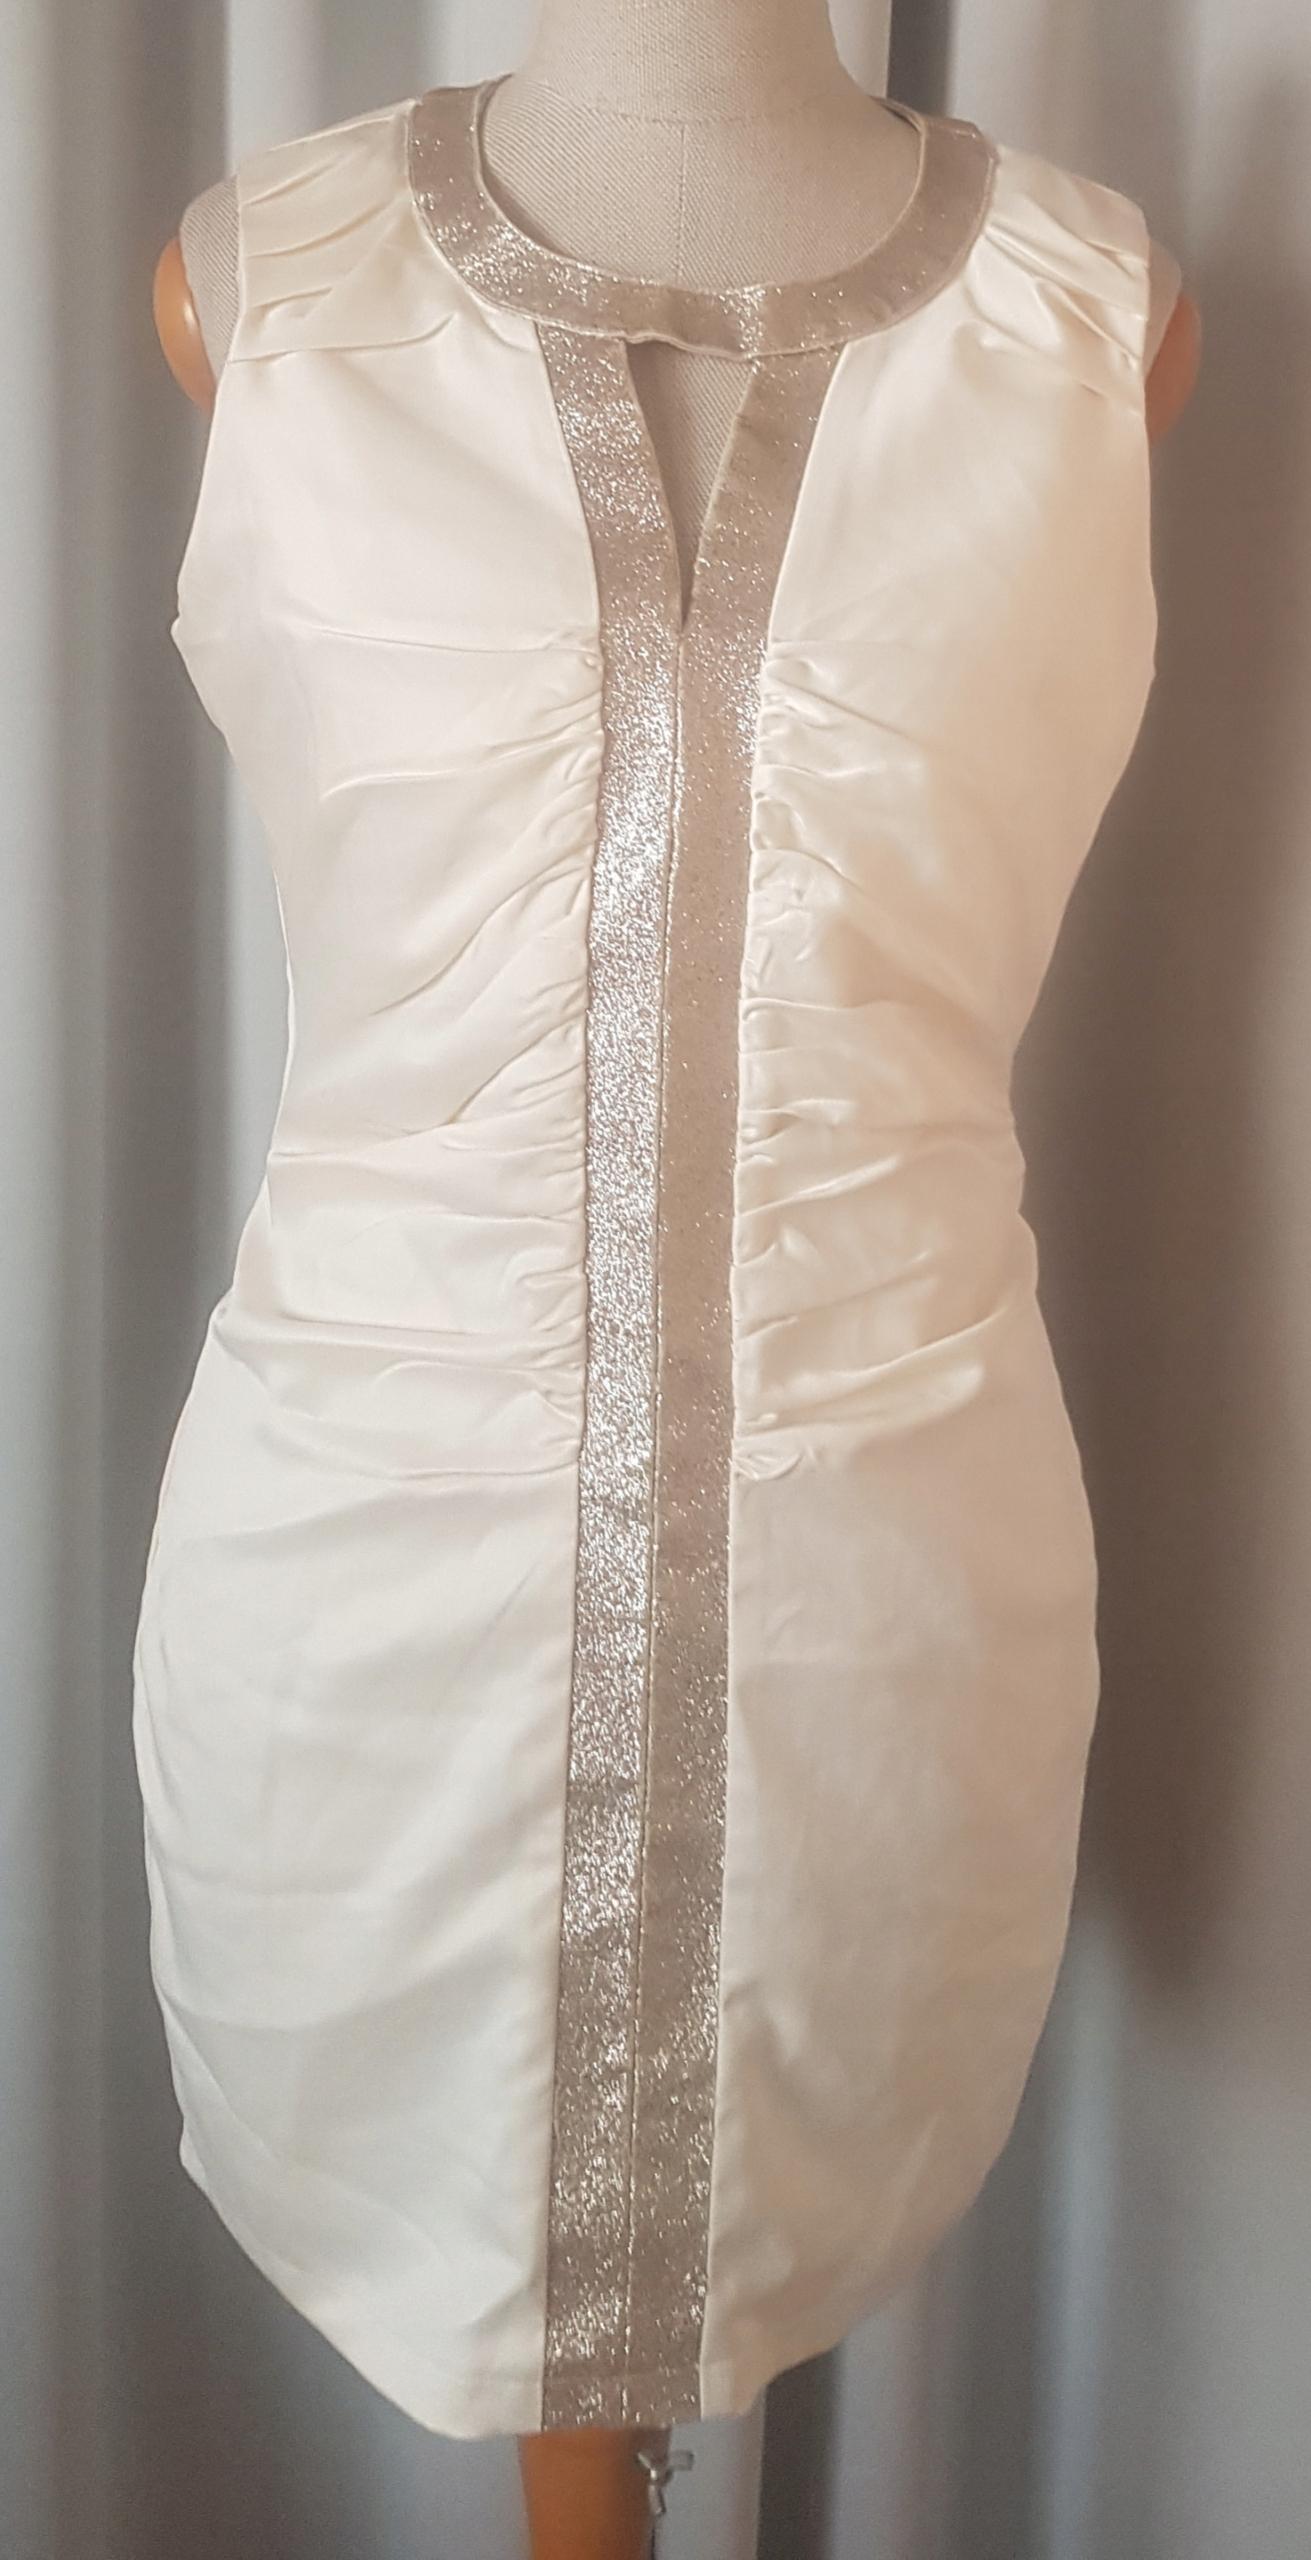 Sukienka Mohito 38 M piękna ecru stan idealny